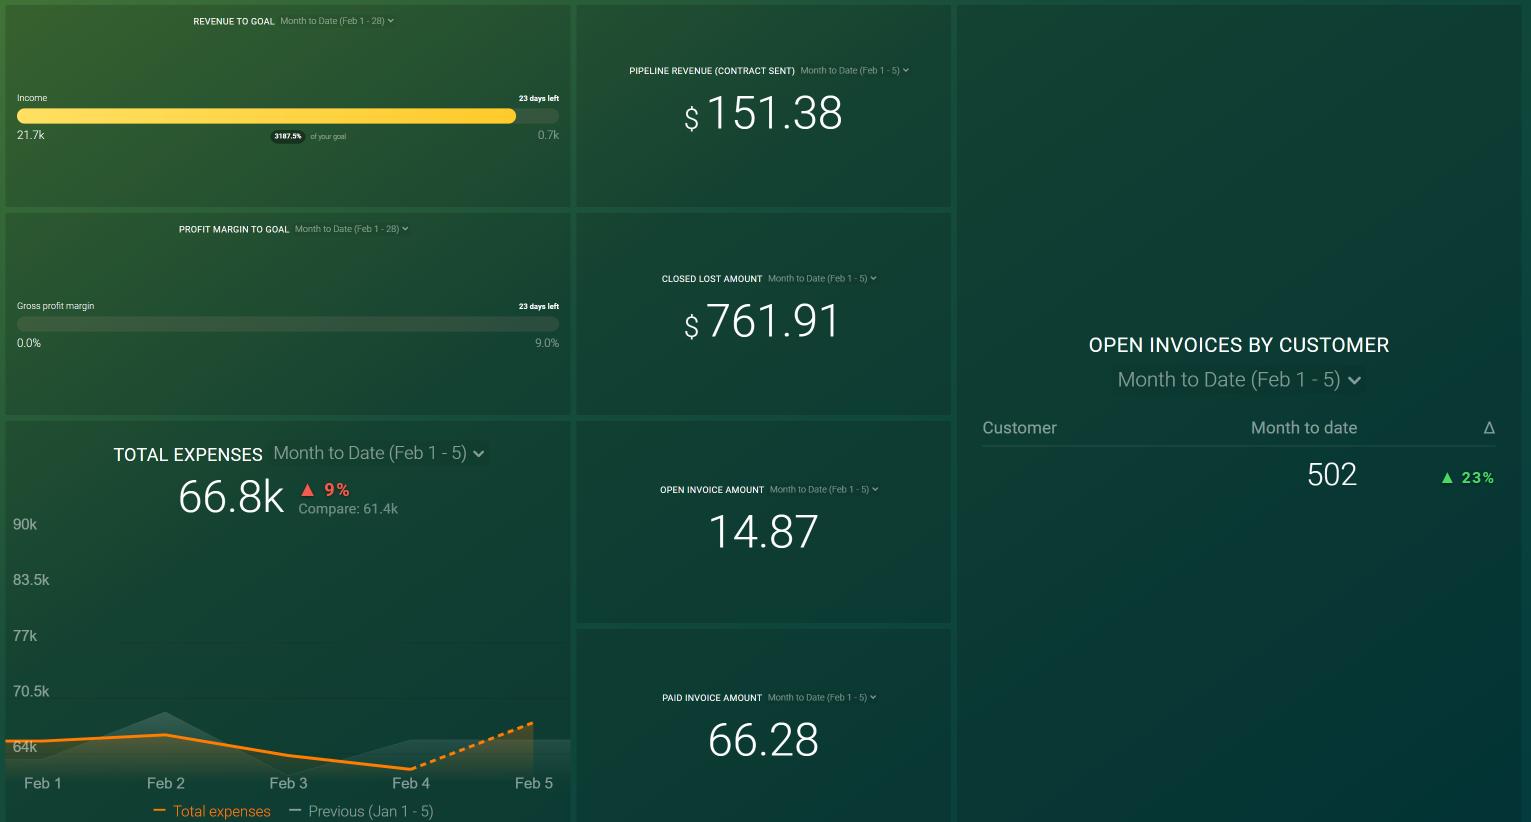 QuickBooks + HubSpot CRM: Financial Performance Dashboard Template